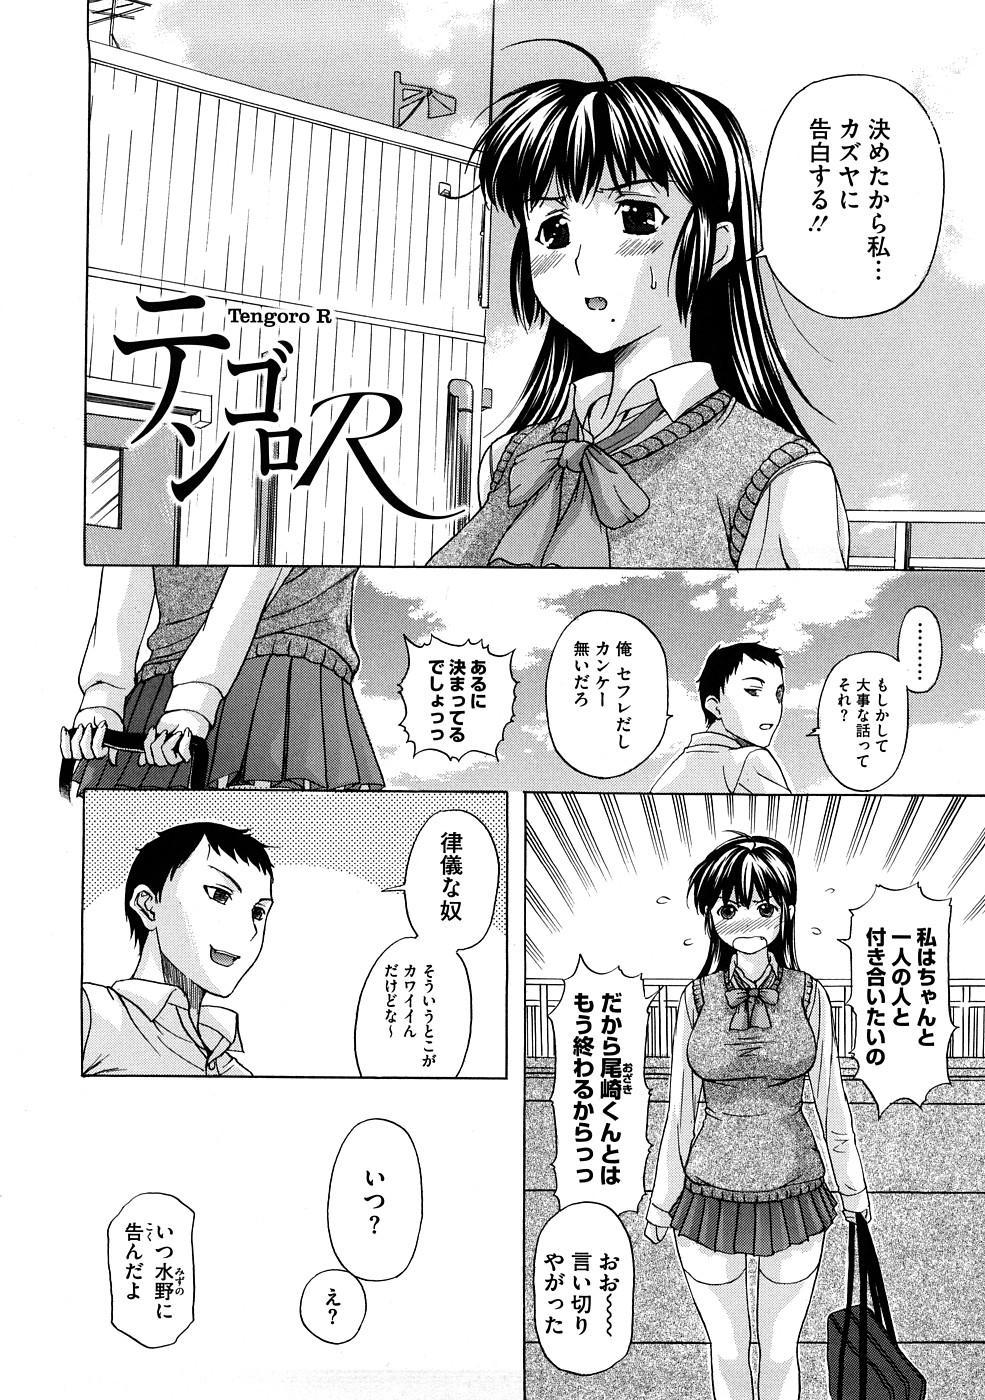 Tengoro Ch.01-07 43